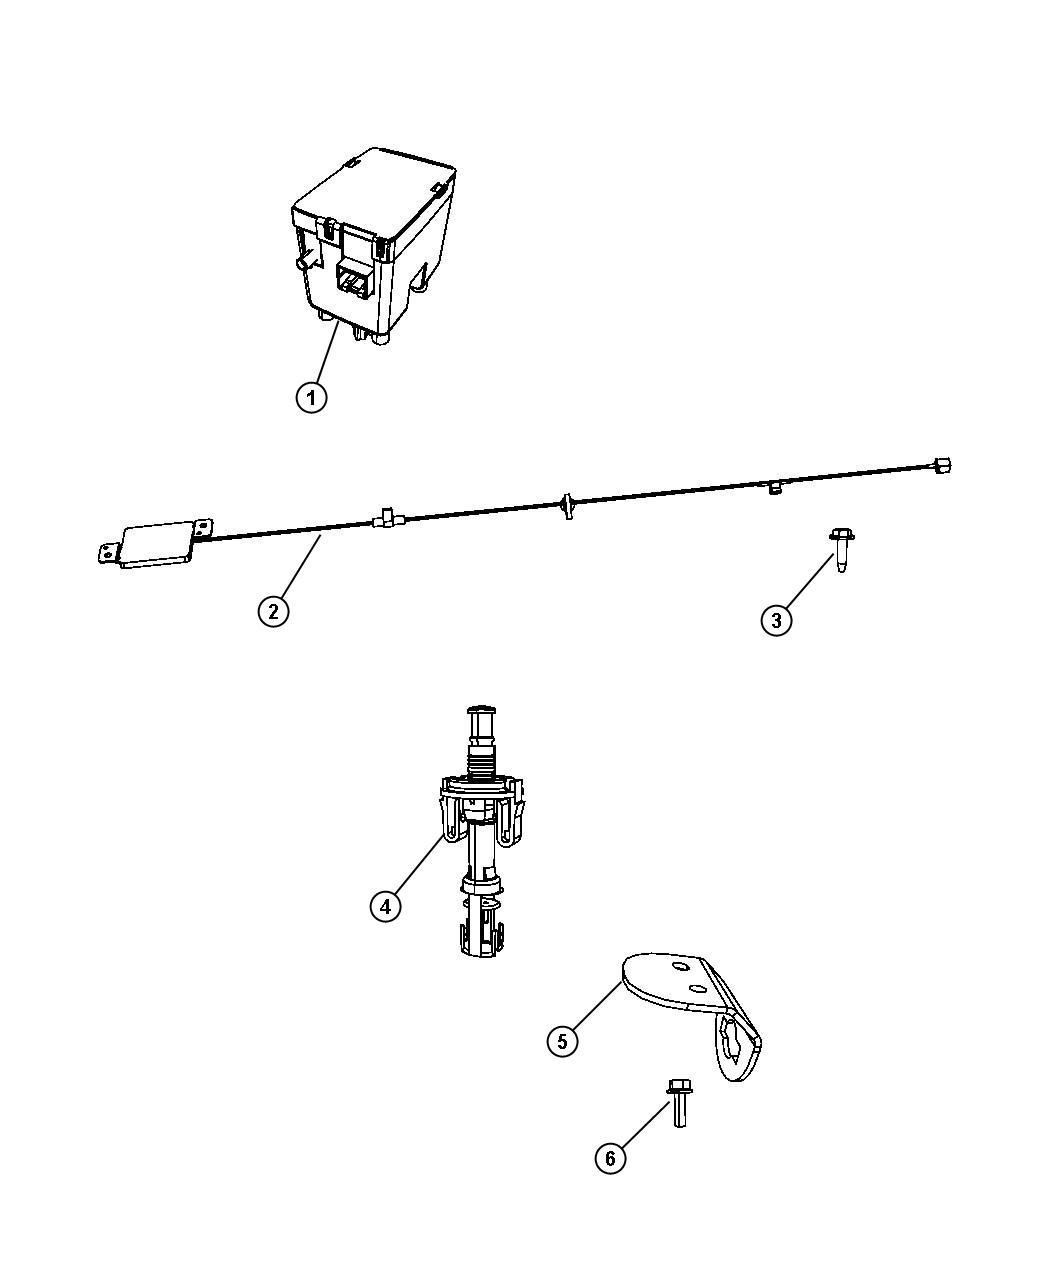 2010 jeep commander antenna  keyless entry   remote start system   xbm  modules  deterrent